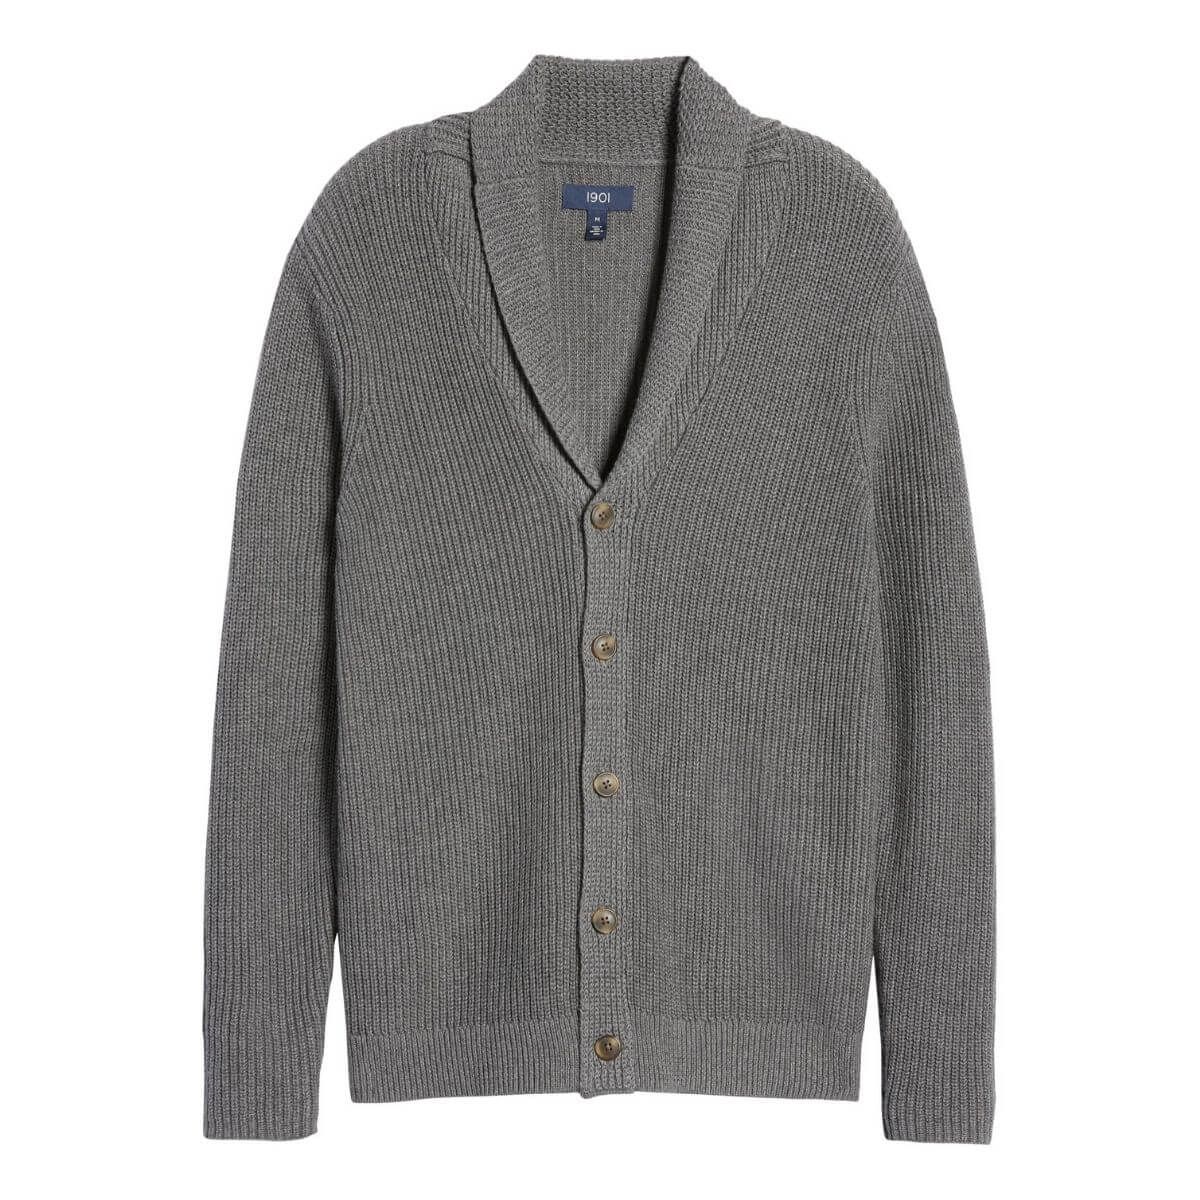 Grey cardigan sweater.